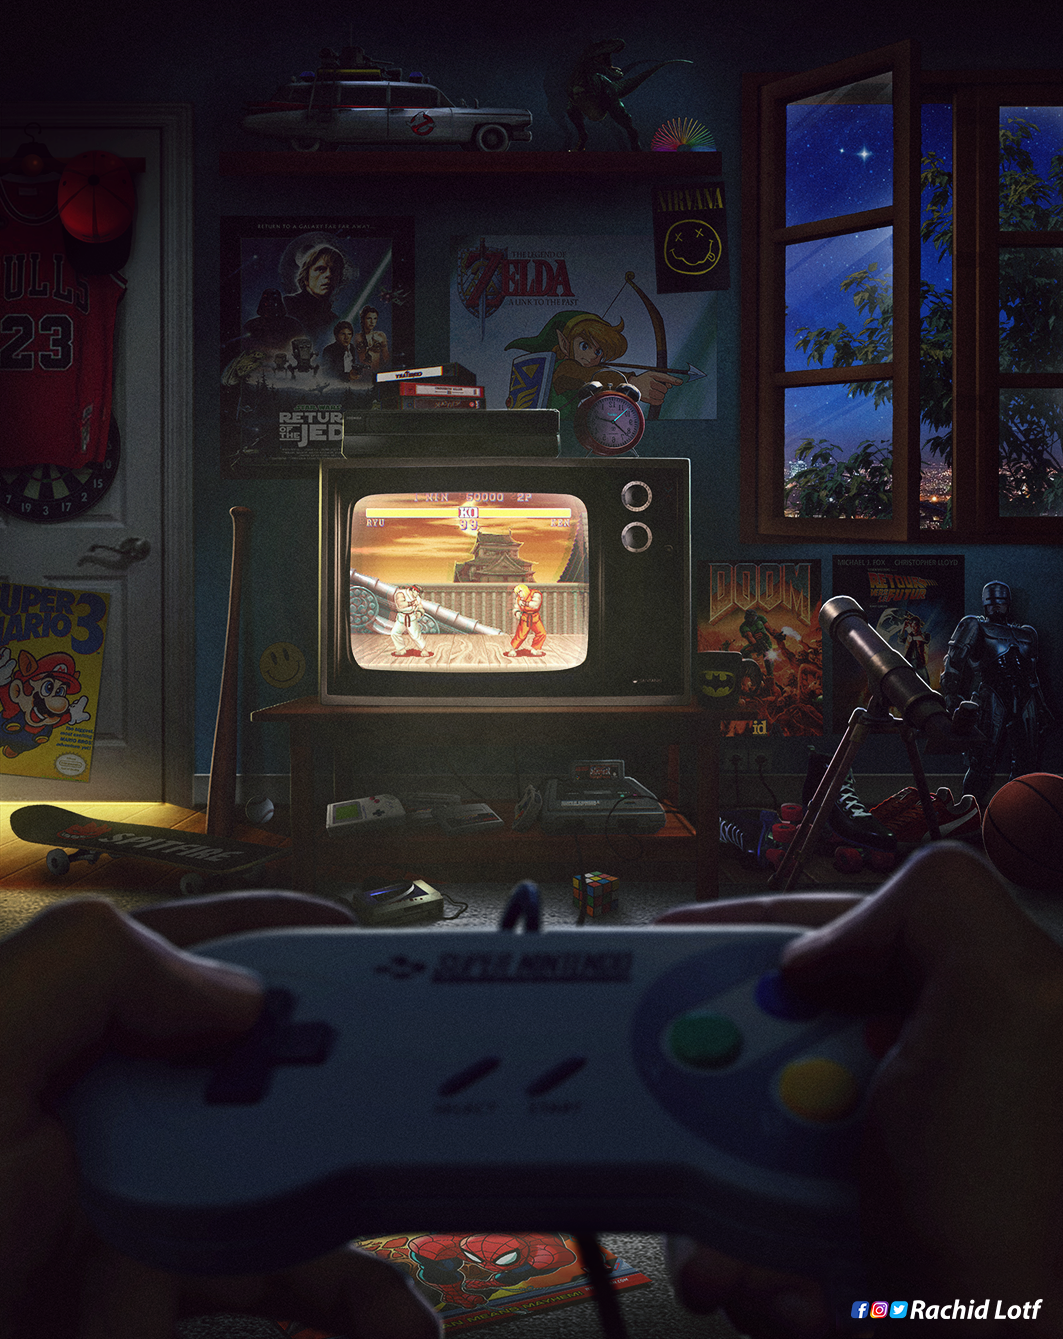 Super Nintendo Retro Games Wallpaper Retro Gaming Art Video Games Artwork